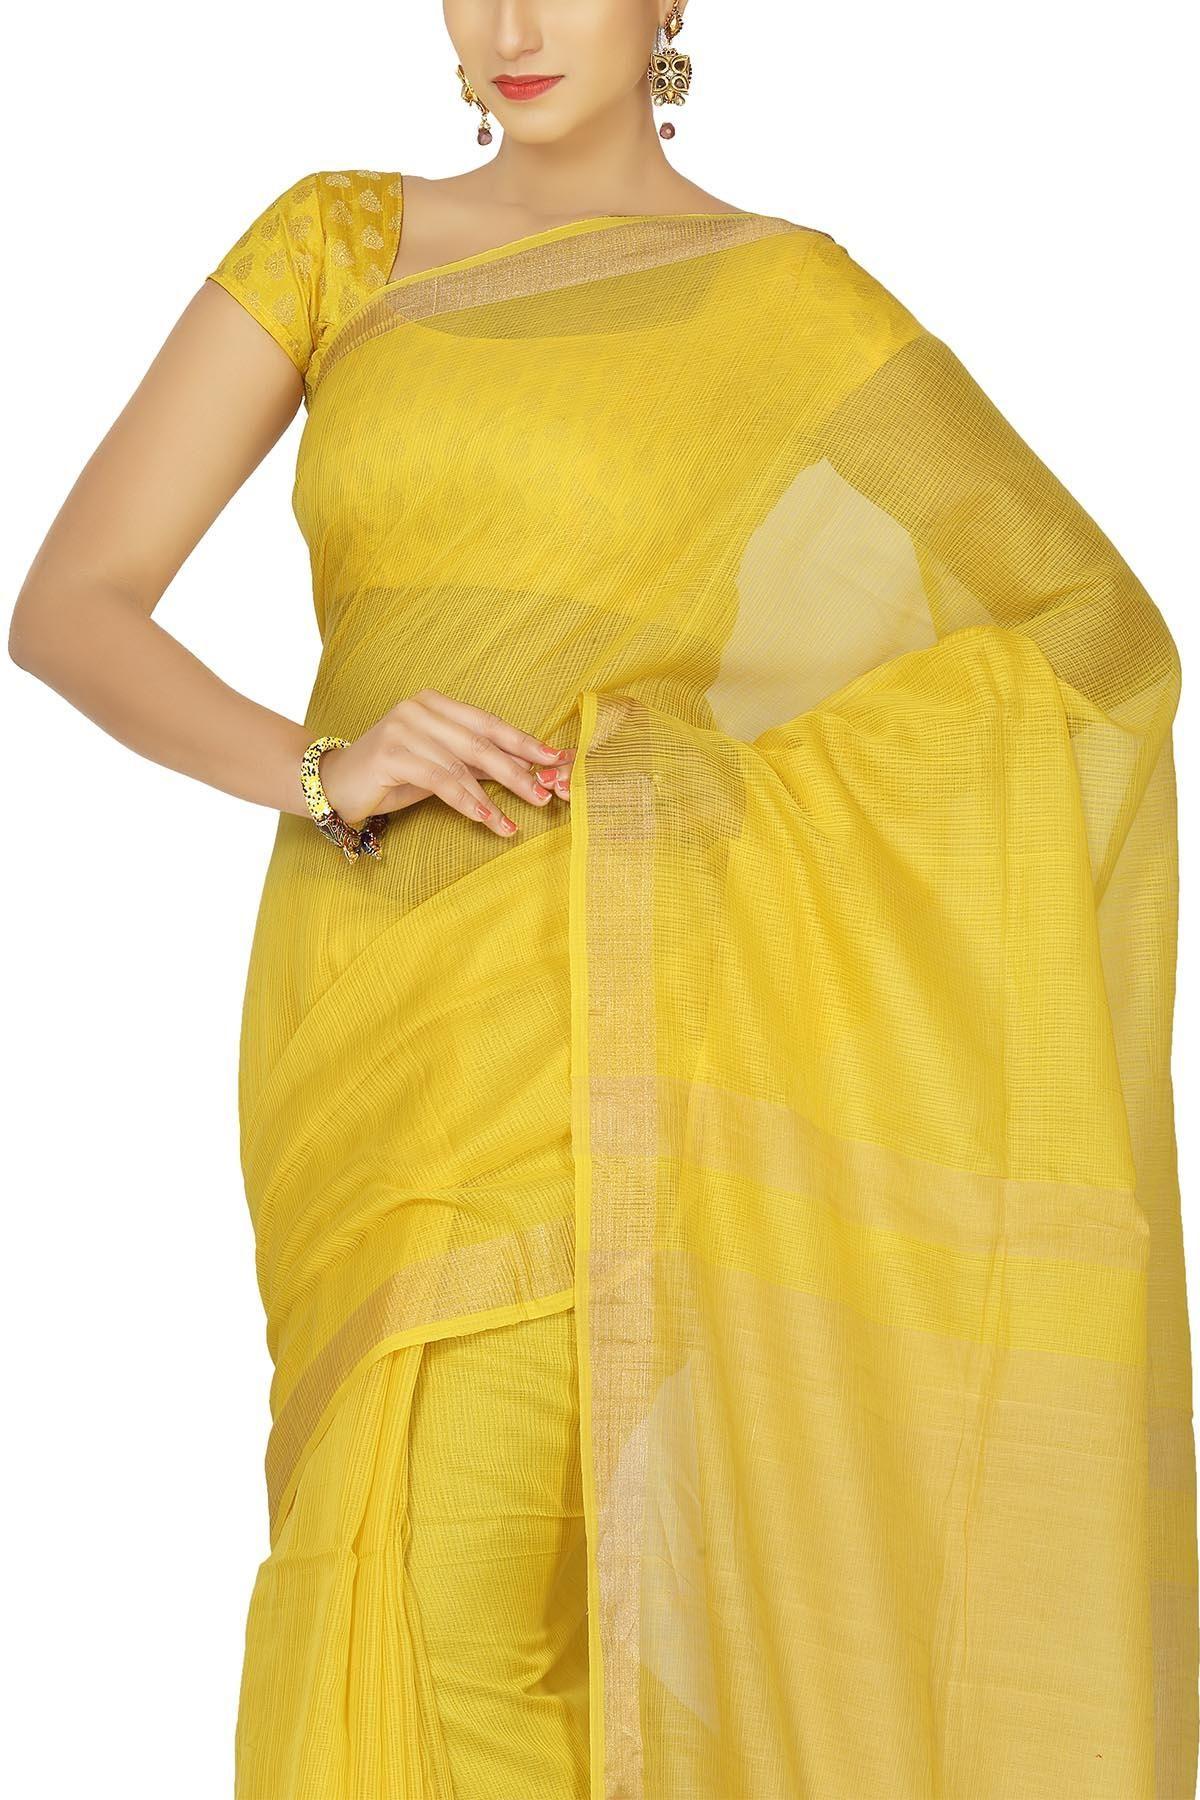 Tissue silk saree golden yellow u zari kota checkered hand woven cotton silk saree